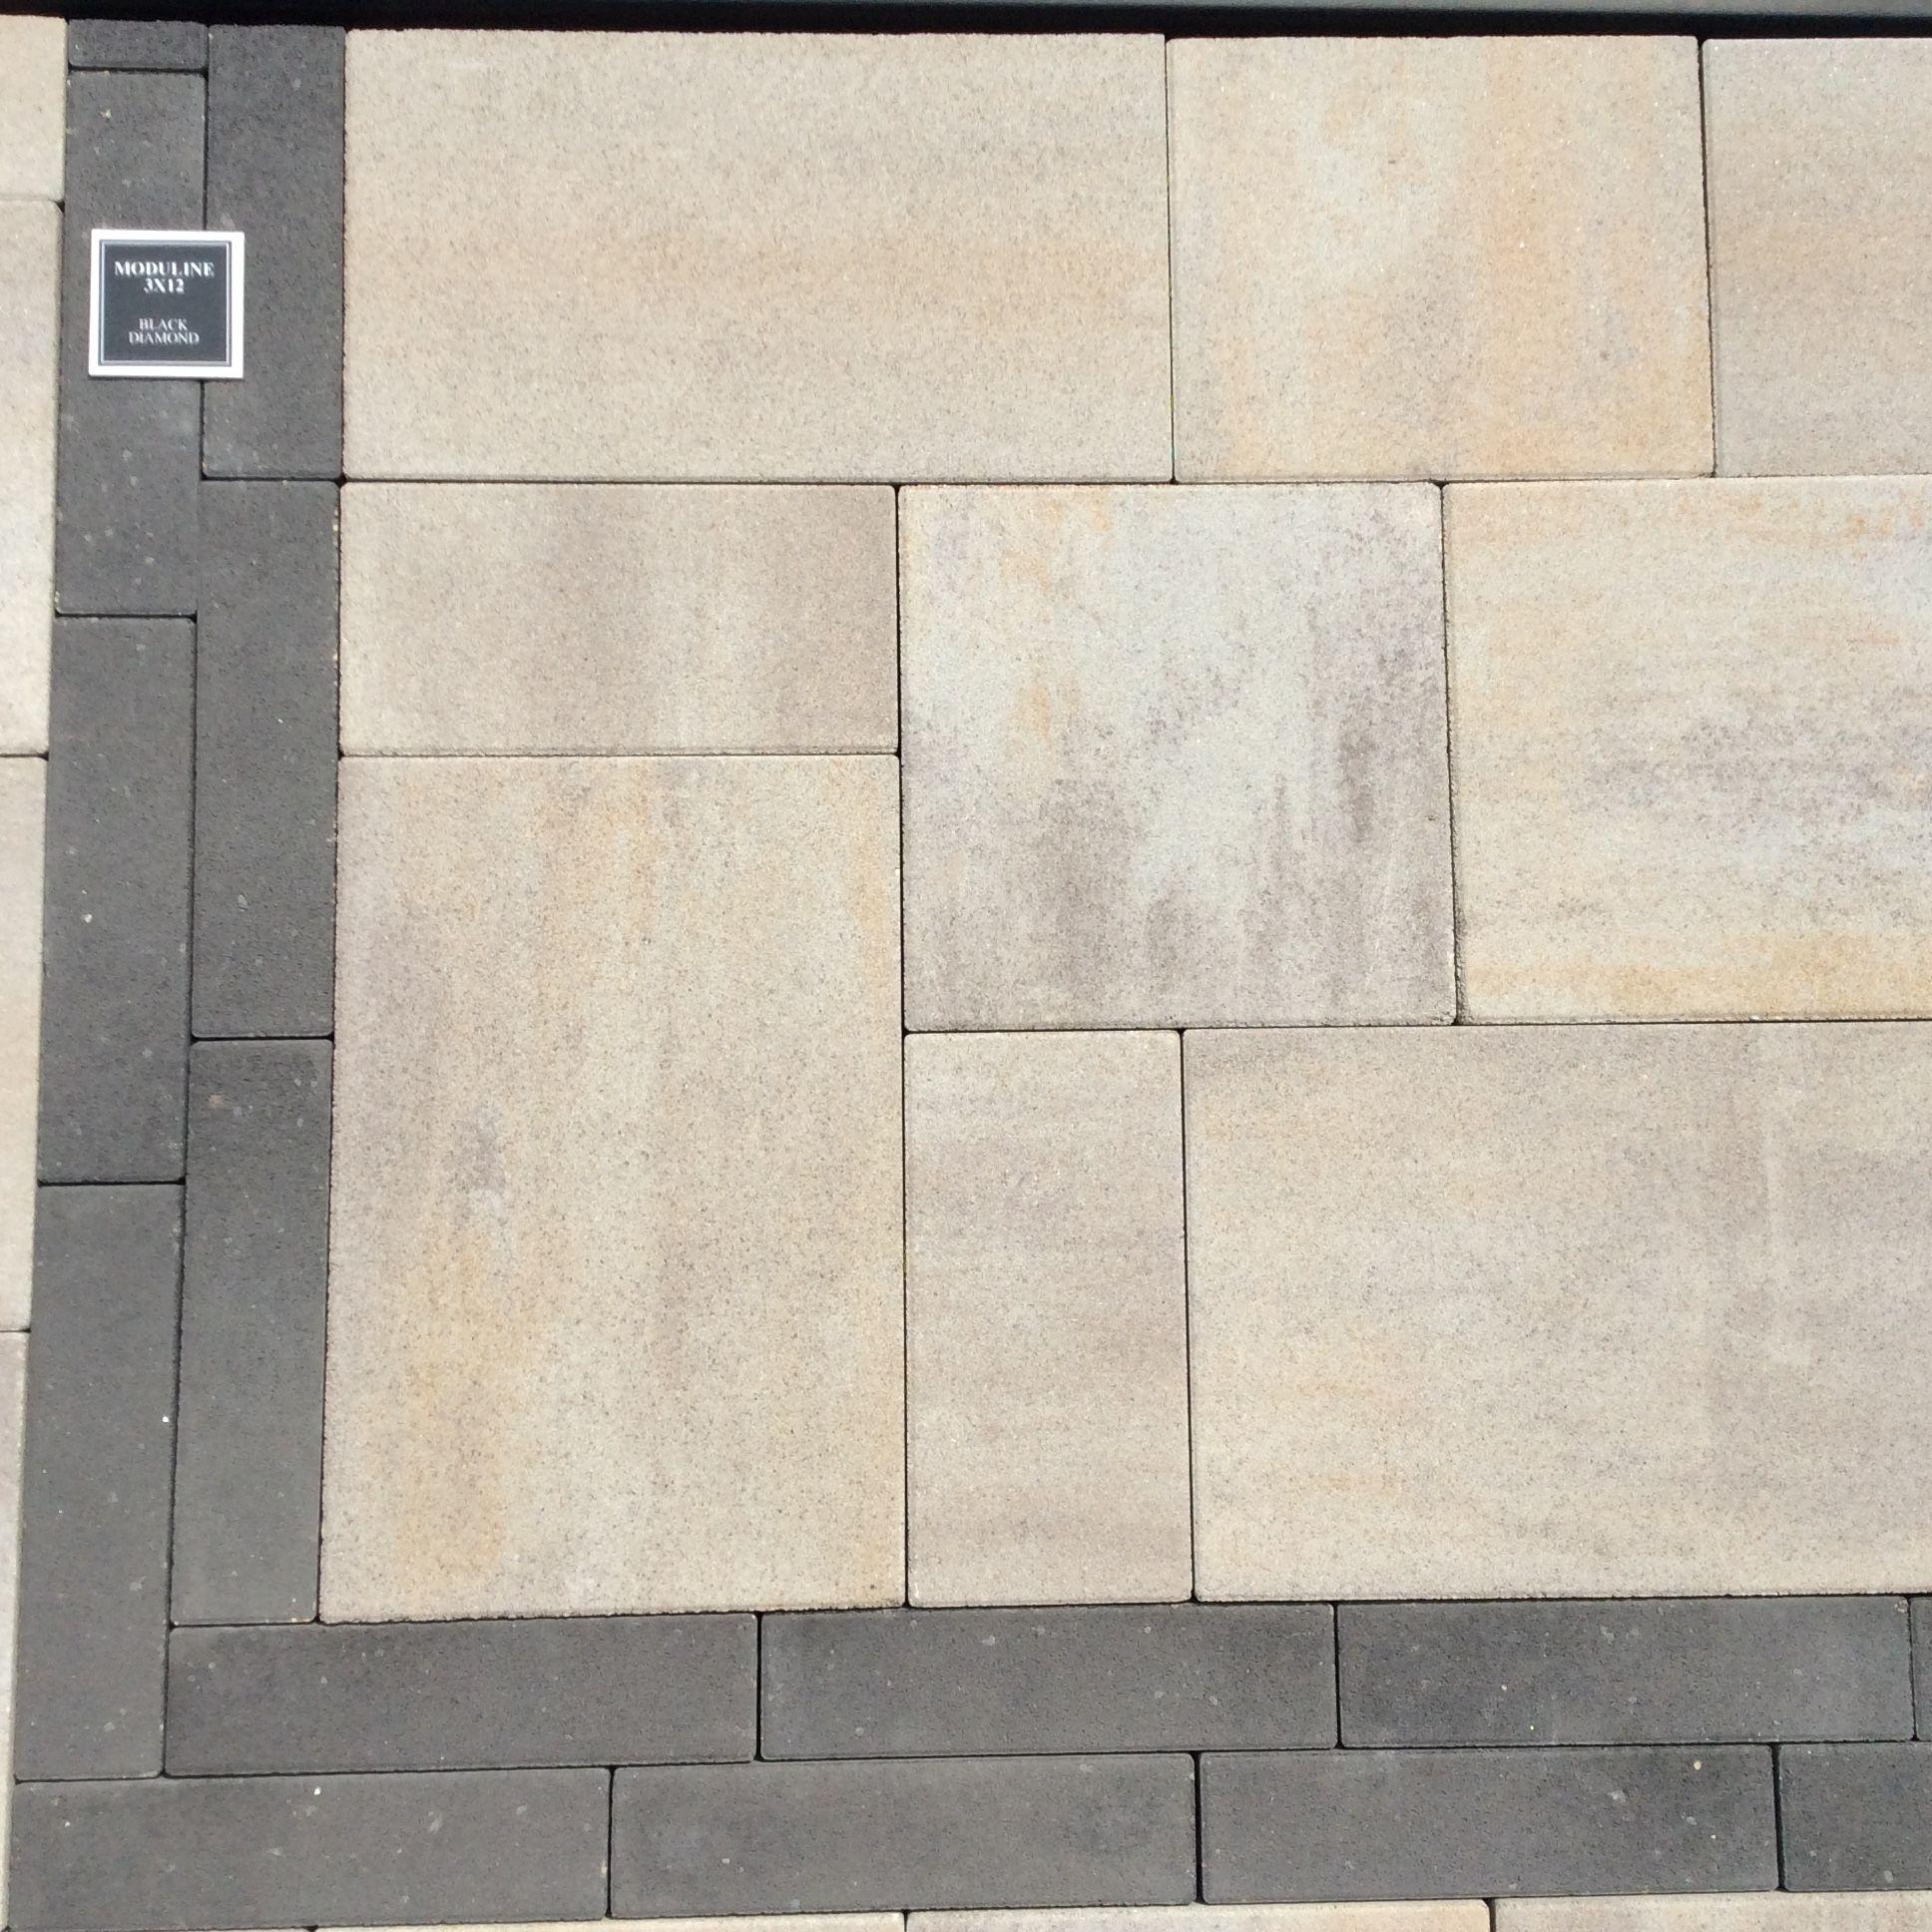 Belgard moduline paver in Danville Beige using all three